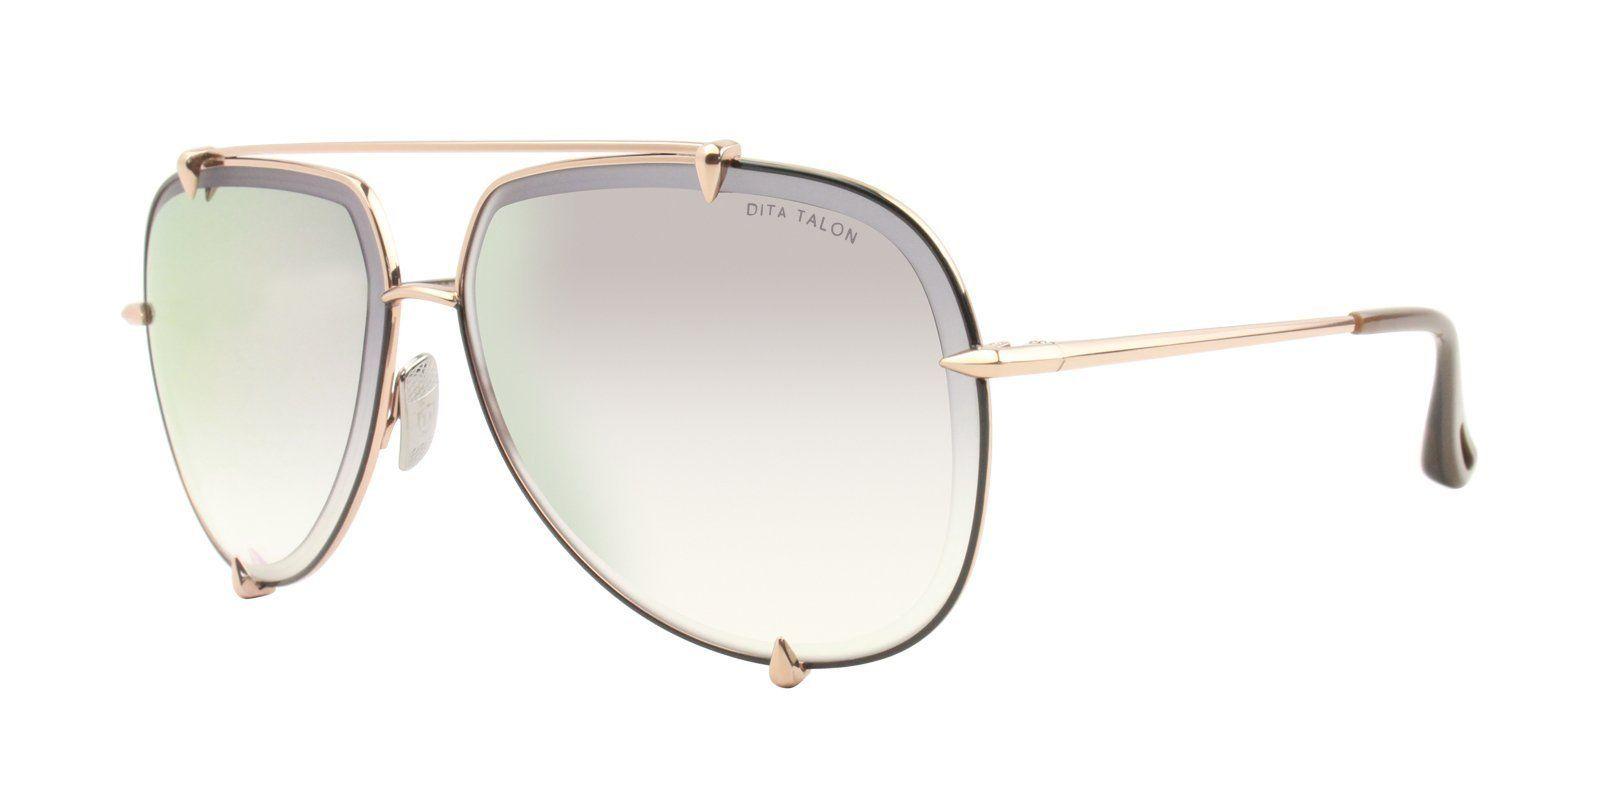 492d19288ba Dita - Talon Rose Gold - Gold These DITA talon rose gold sunglasses have  gold-